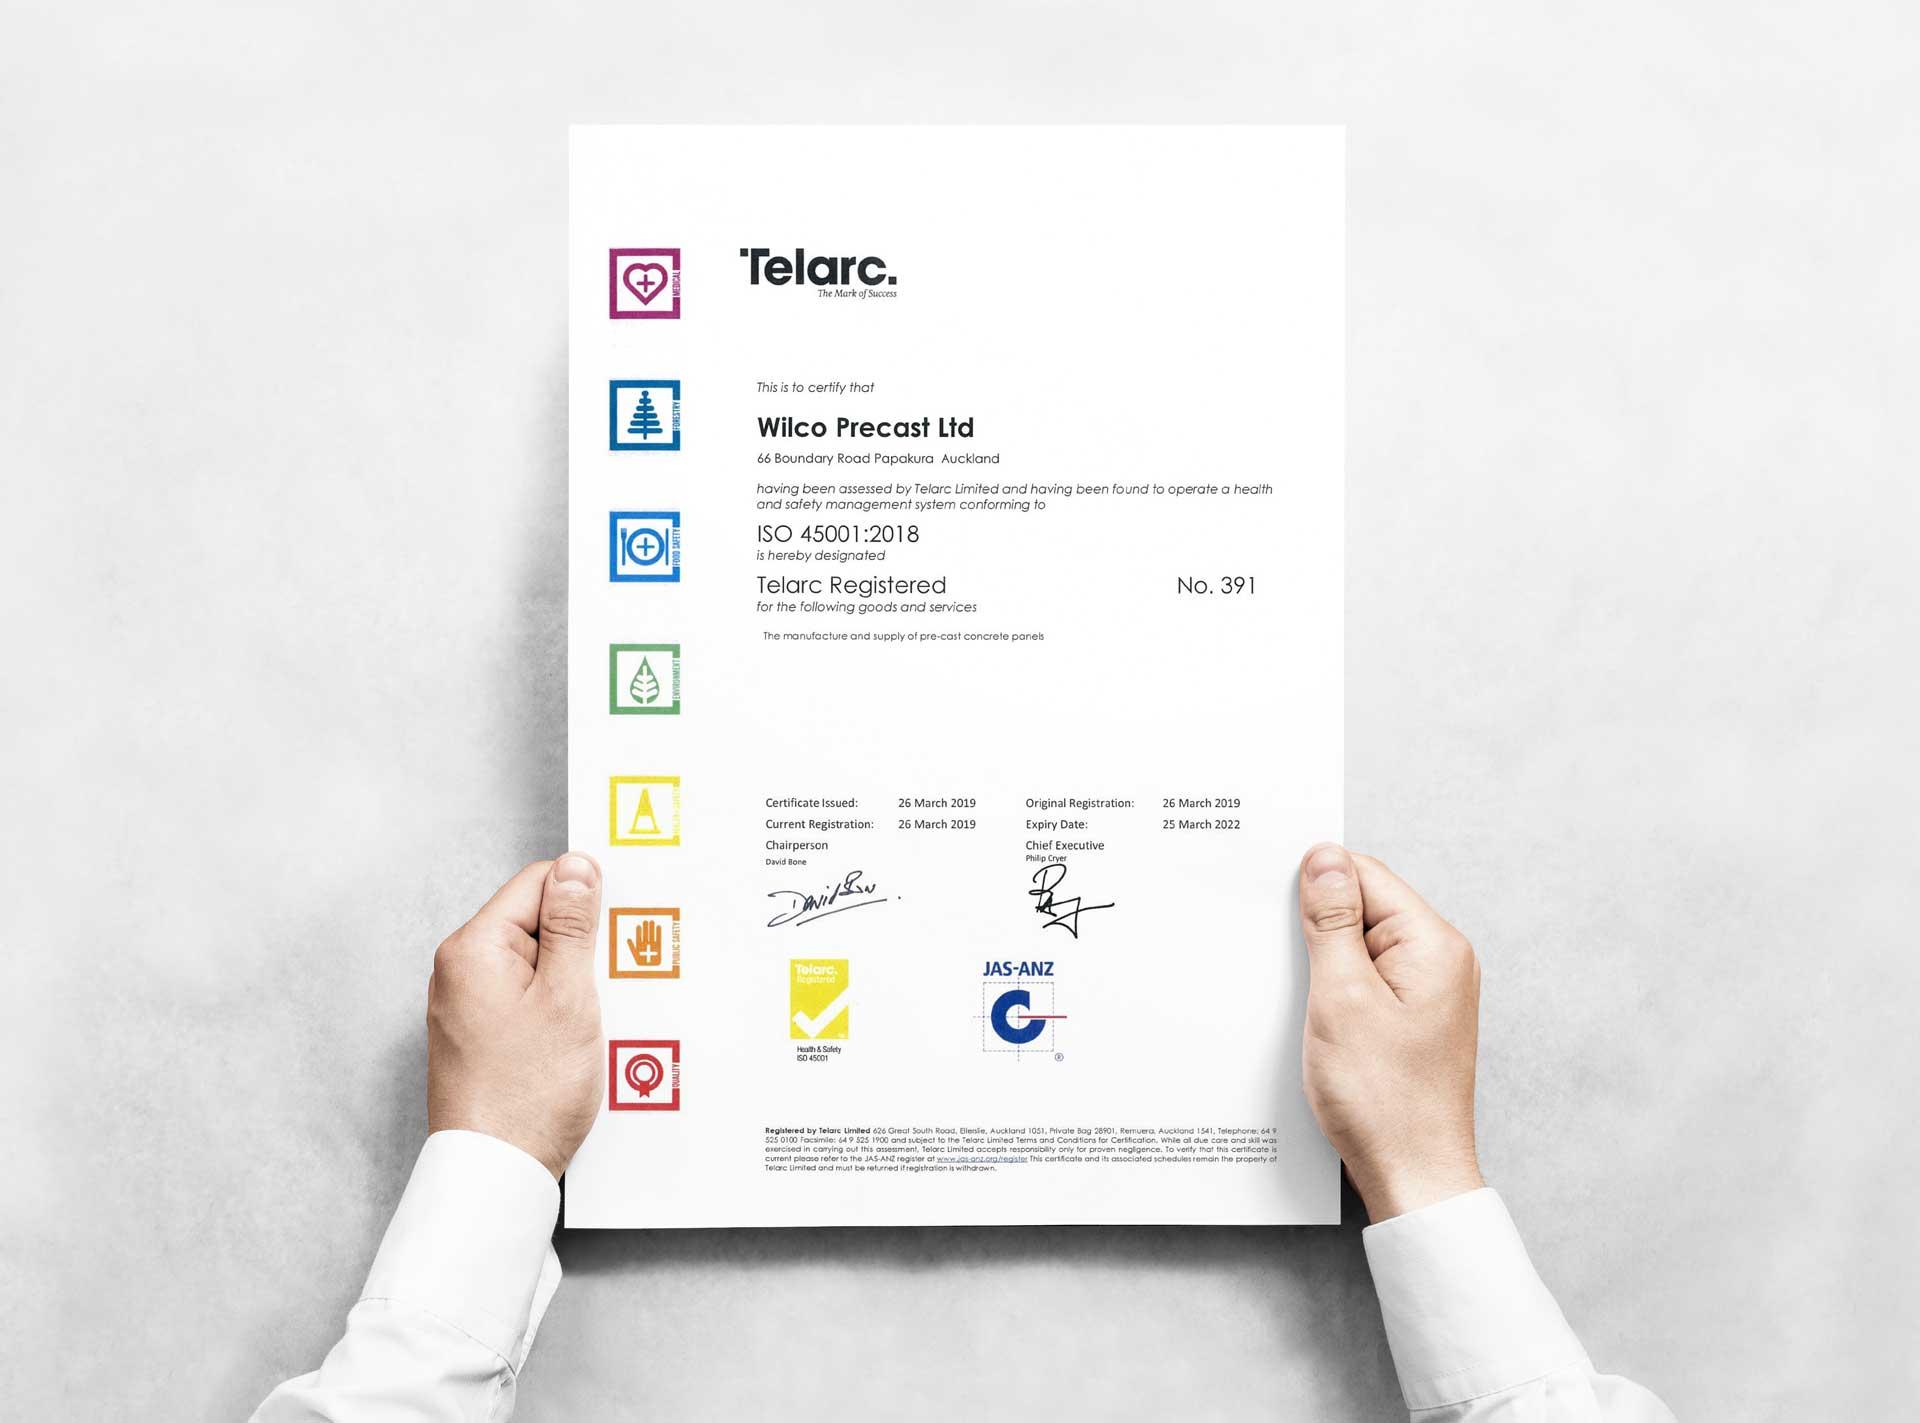 telarc registration